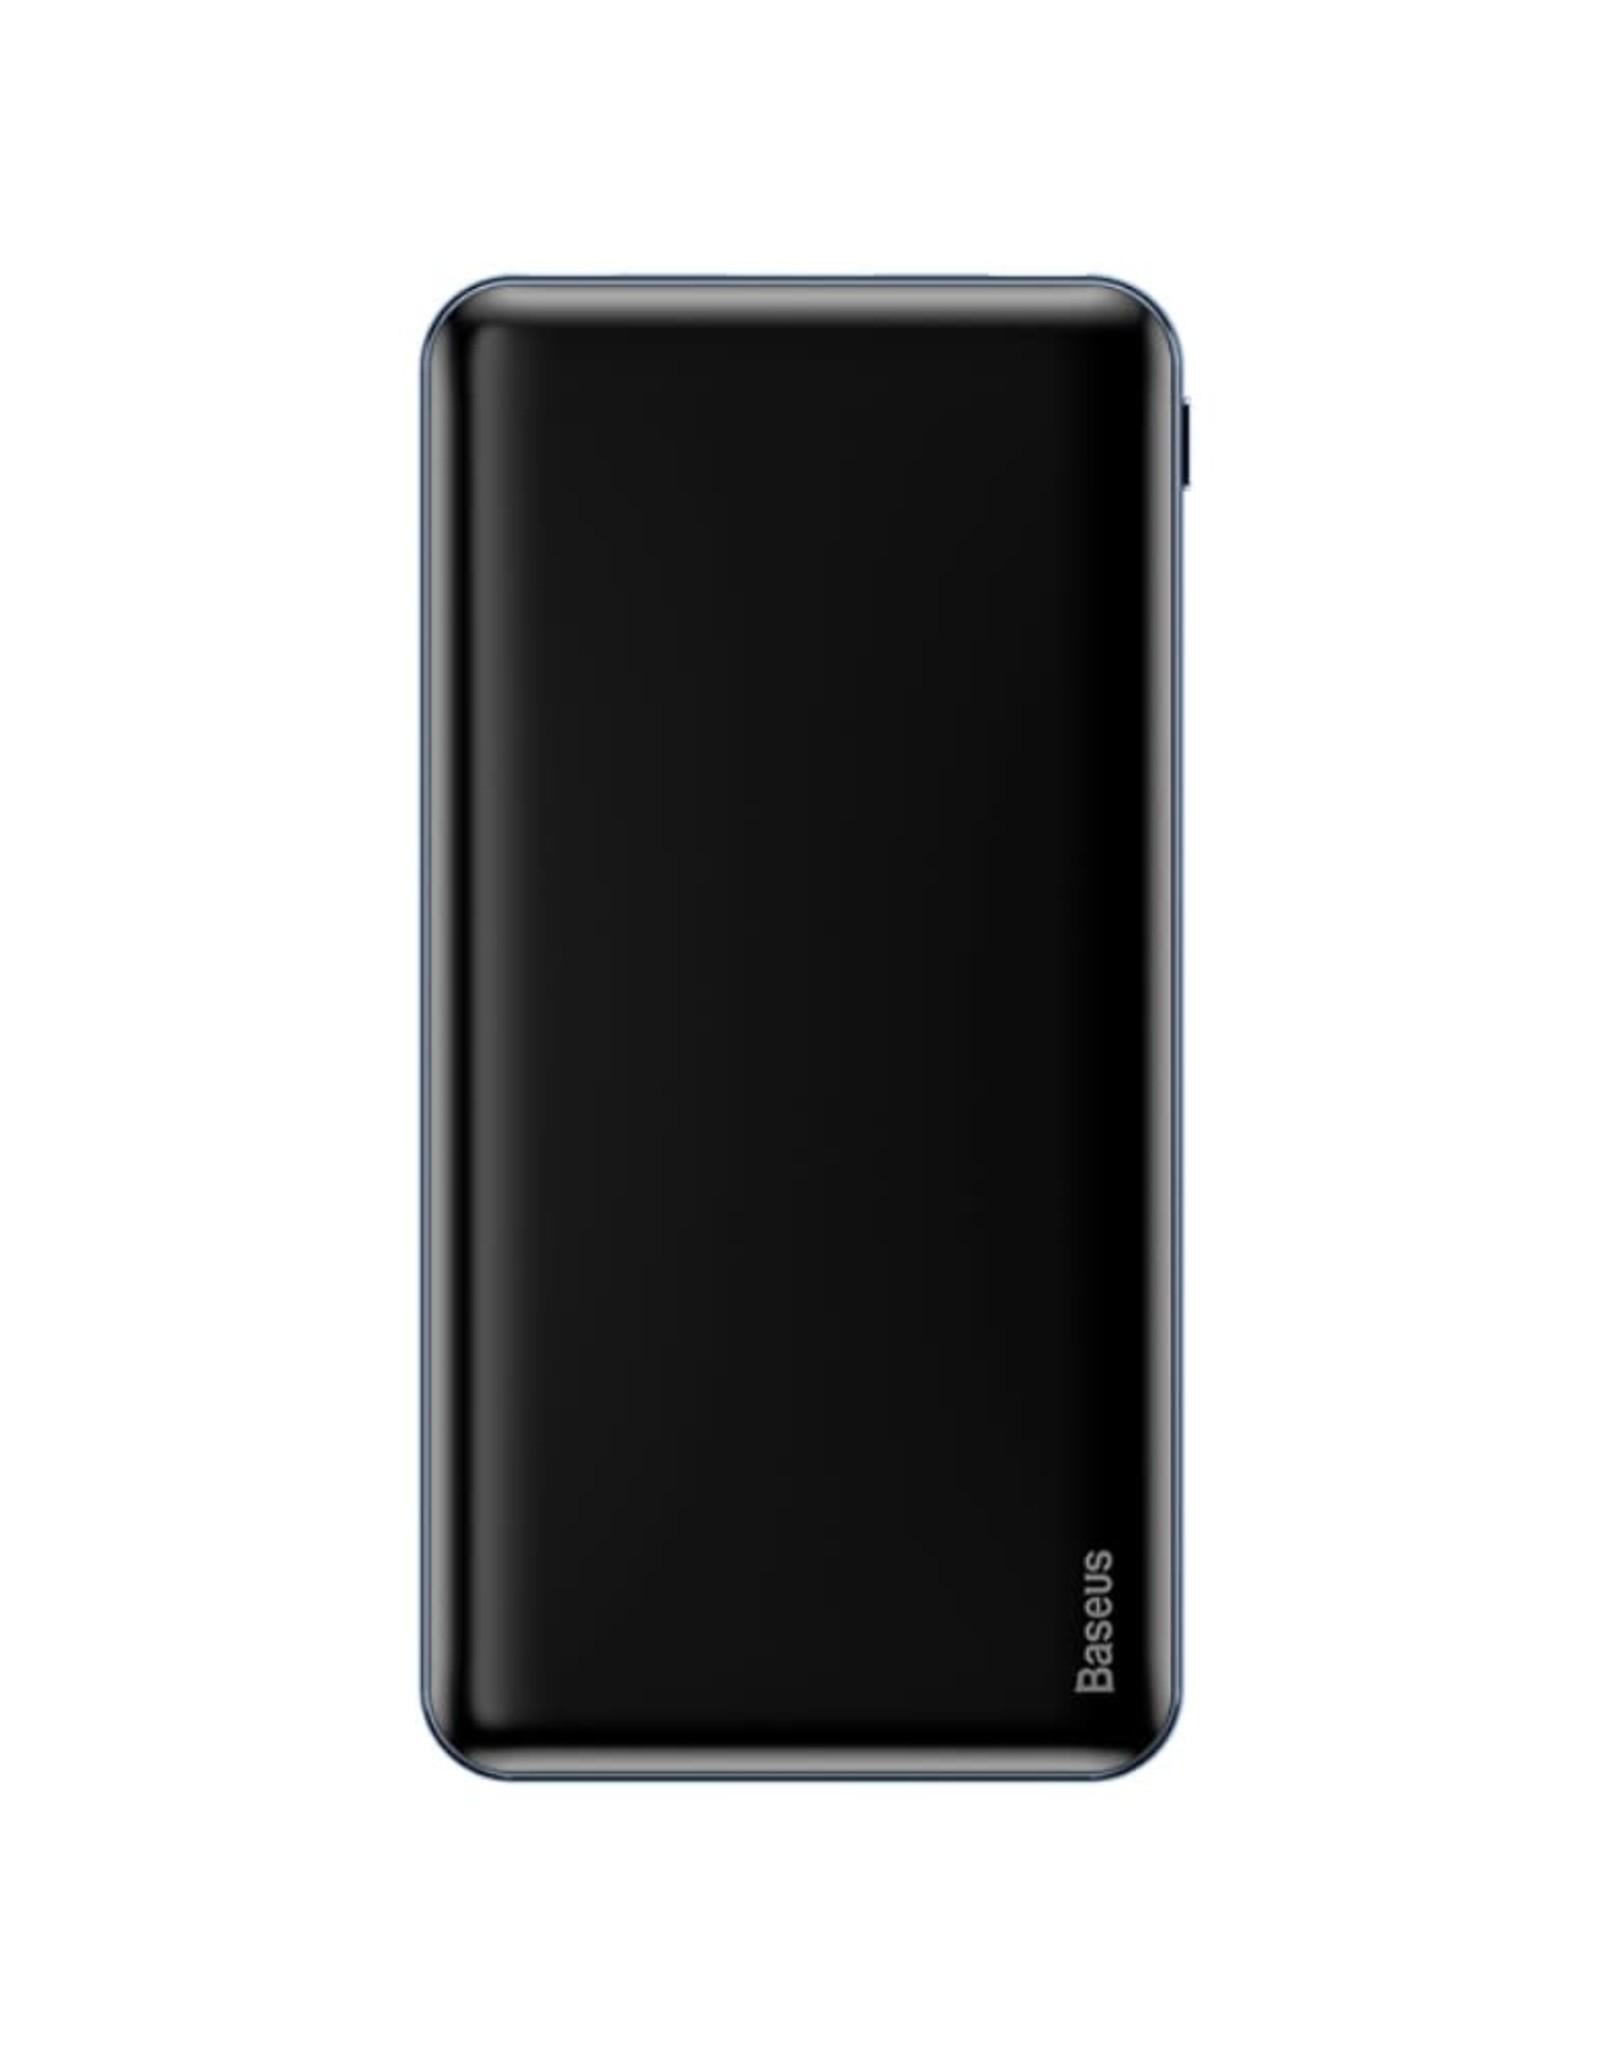 BASEUS M21 Simbo Smart 10000mAh PD Two-way 3A Fast Charging Power Bank - Black